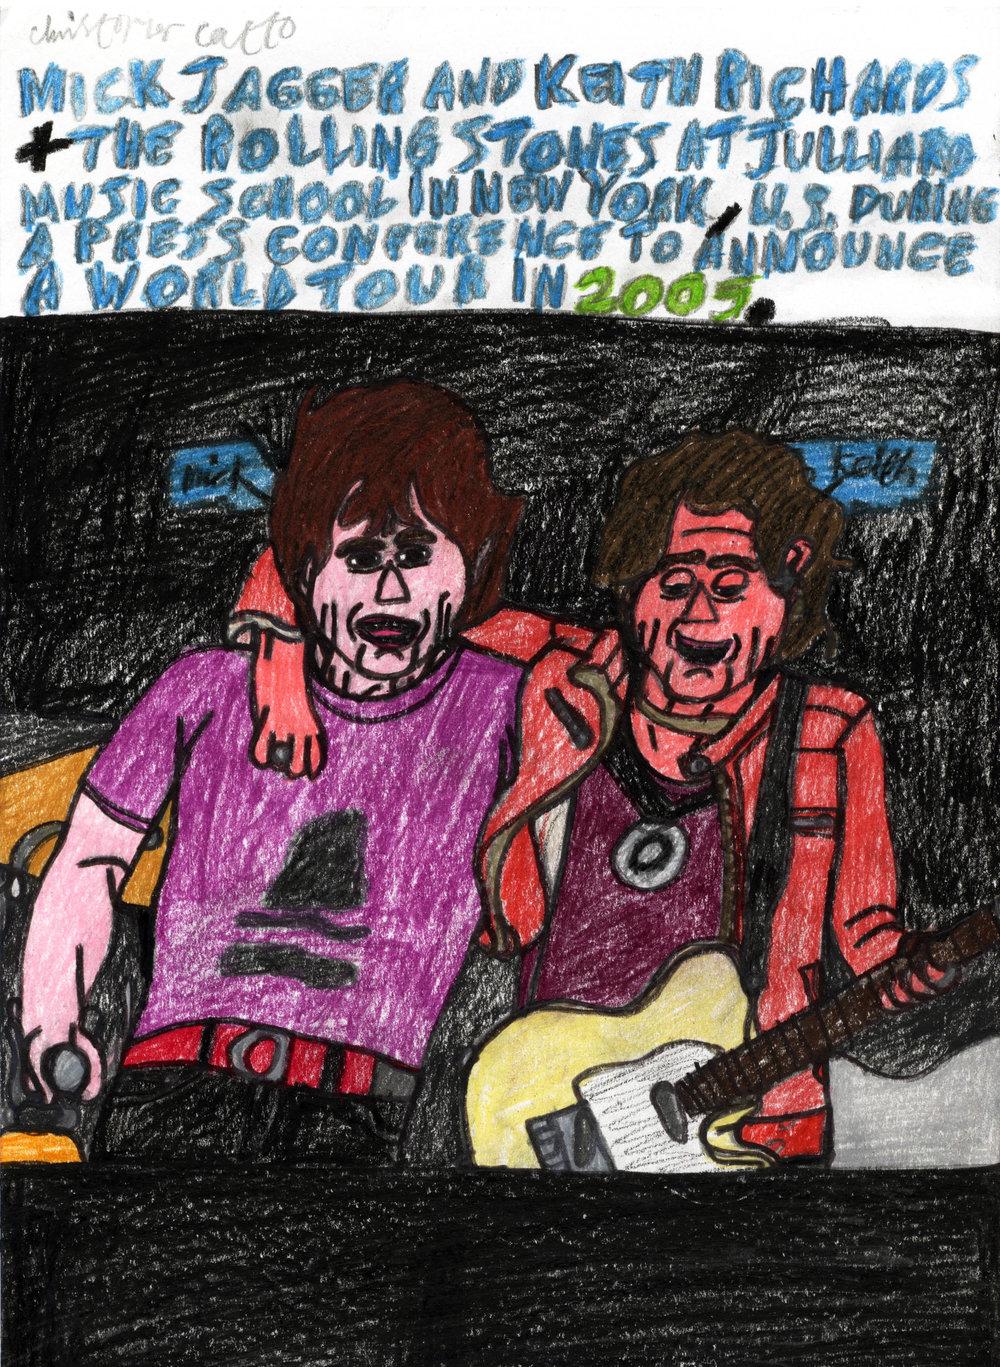 Mick_Jagger_Keith_Richards_01 copy.jpeg